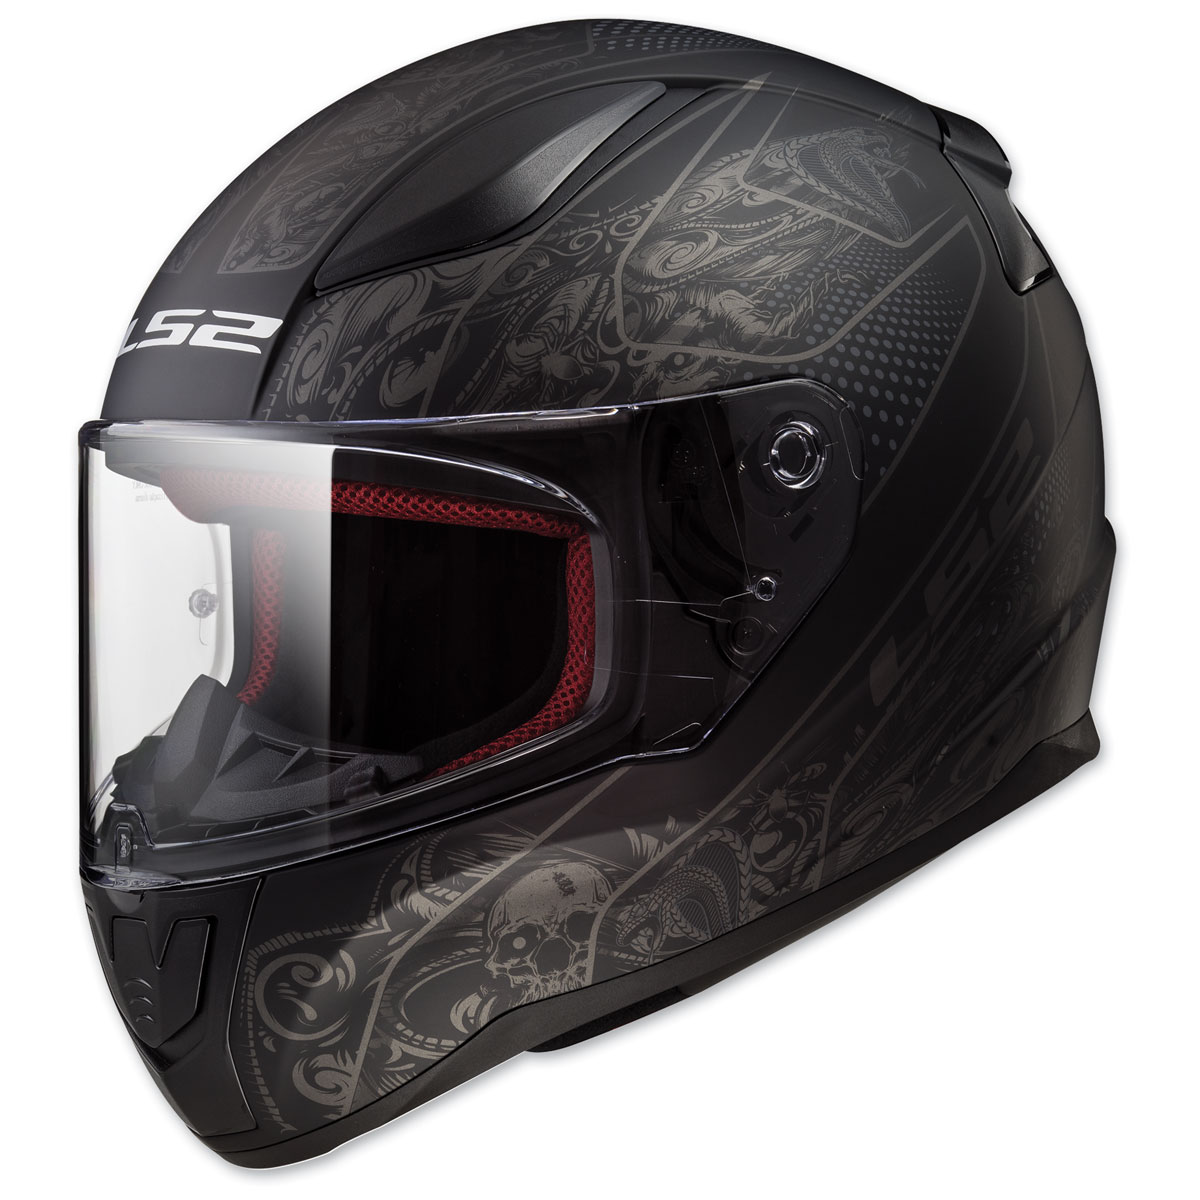 LS2 Rapid Crypt Matte Black Full Face Helmet